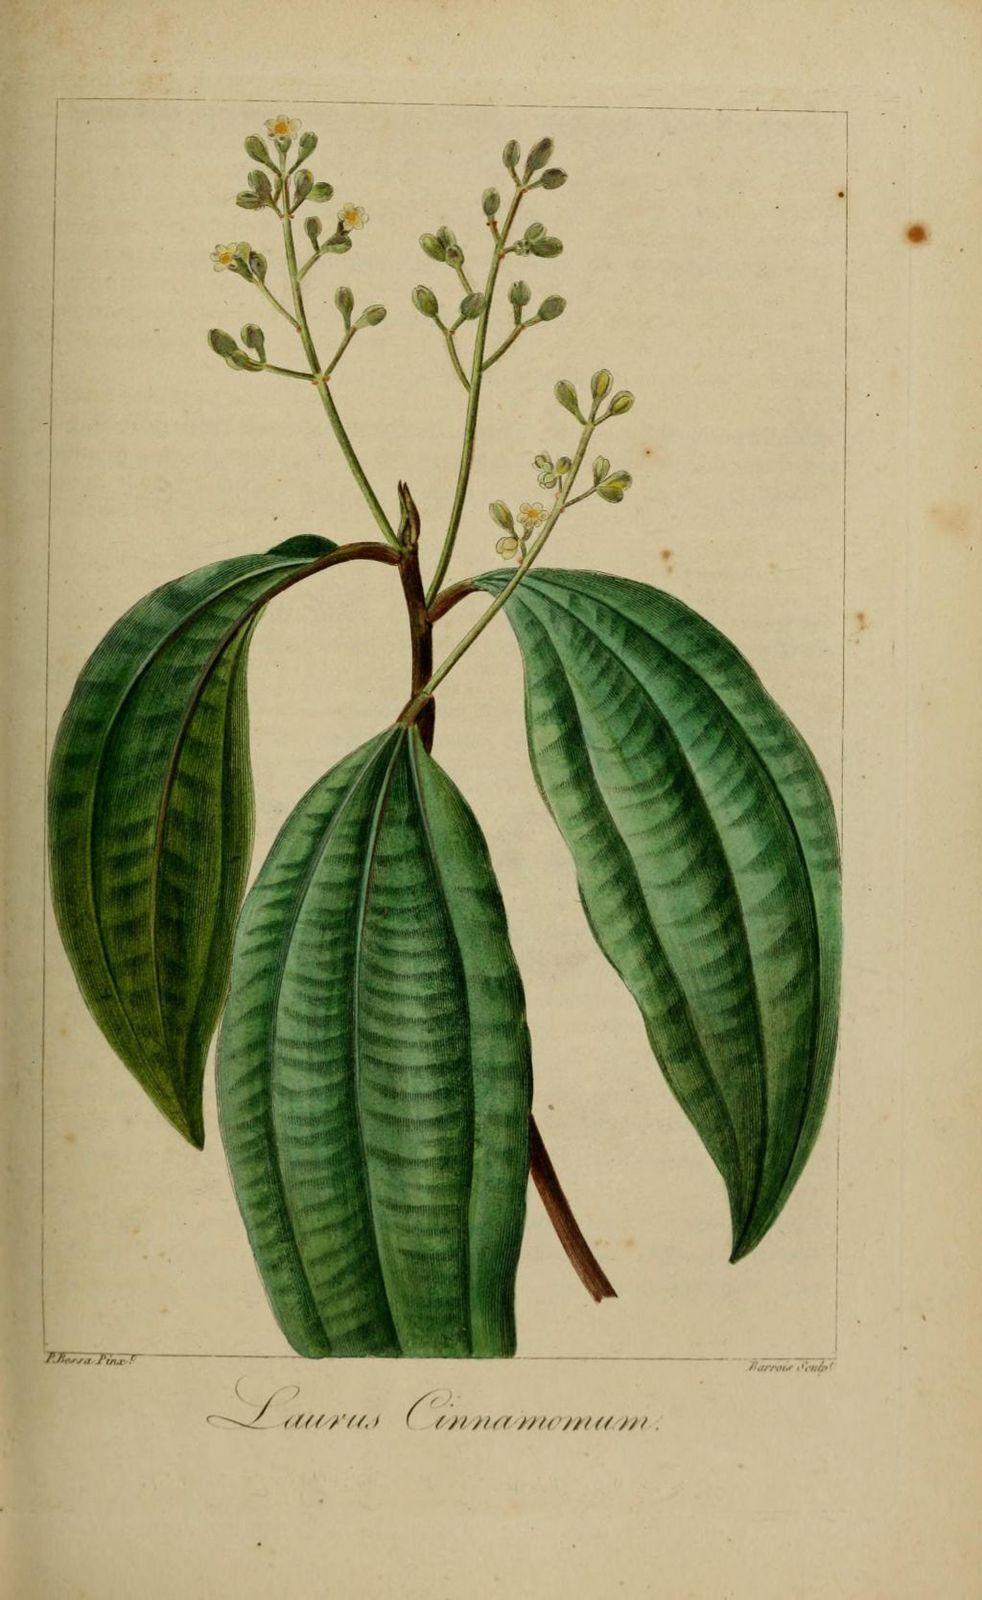 40215 laurier cannellier - laurus cinnamomum